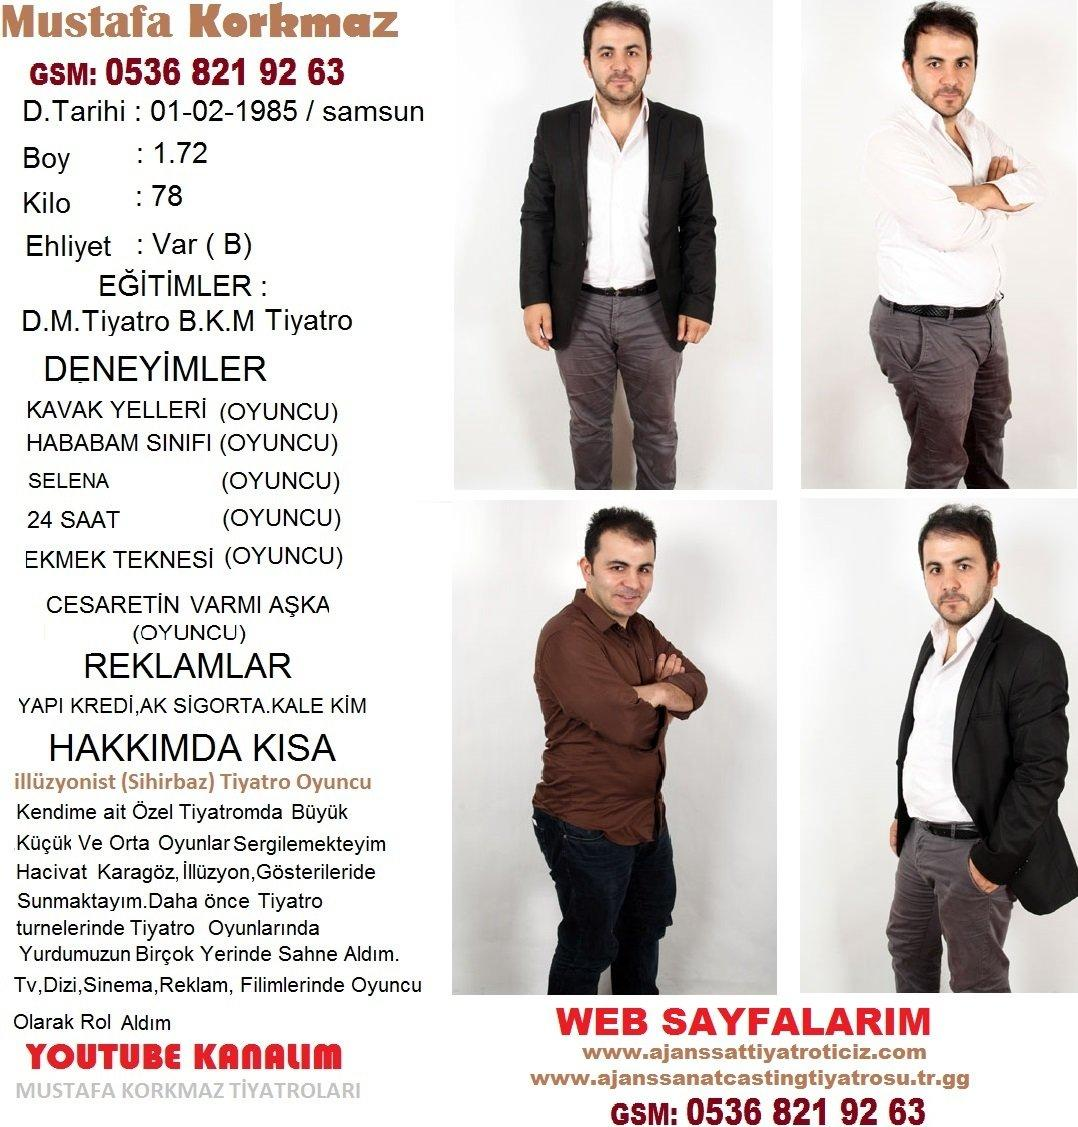 Mustafa Korkmaz Oyuncu